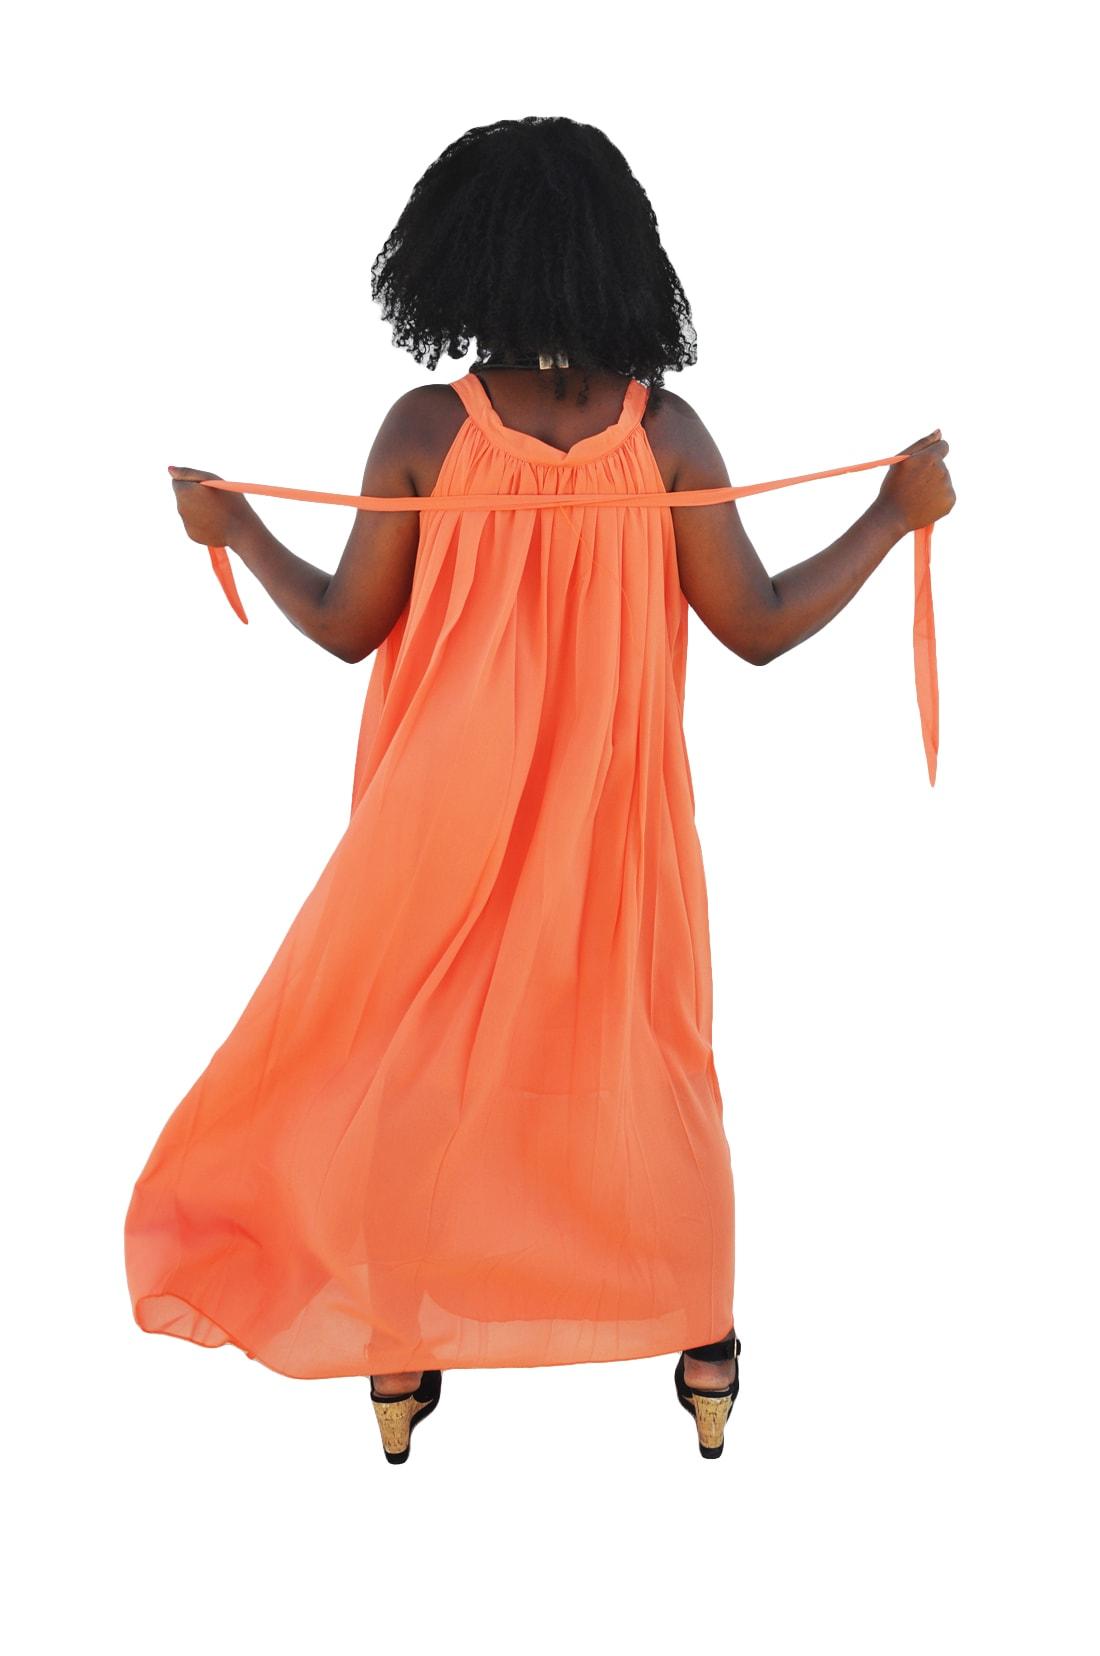 M0247 orange3 Wedding Bridesmaid Dresses maureens.com boutique